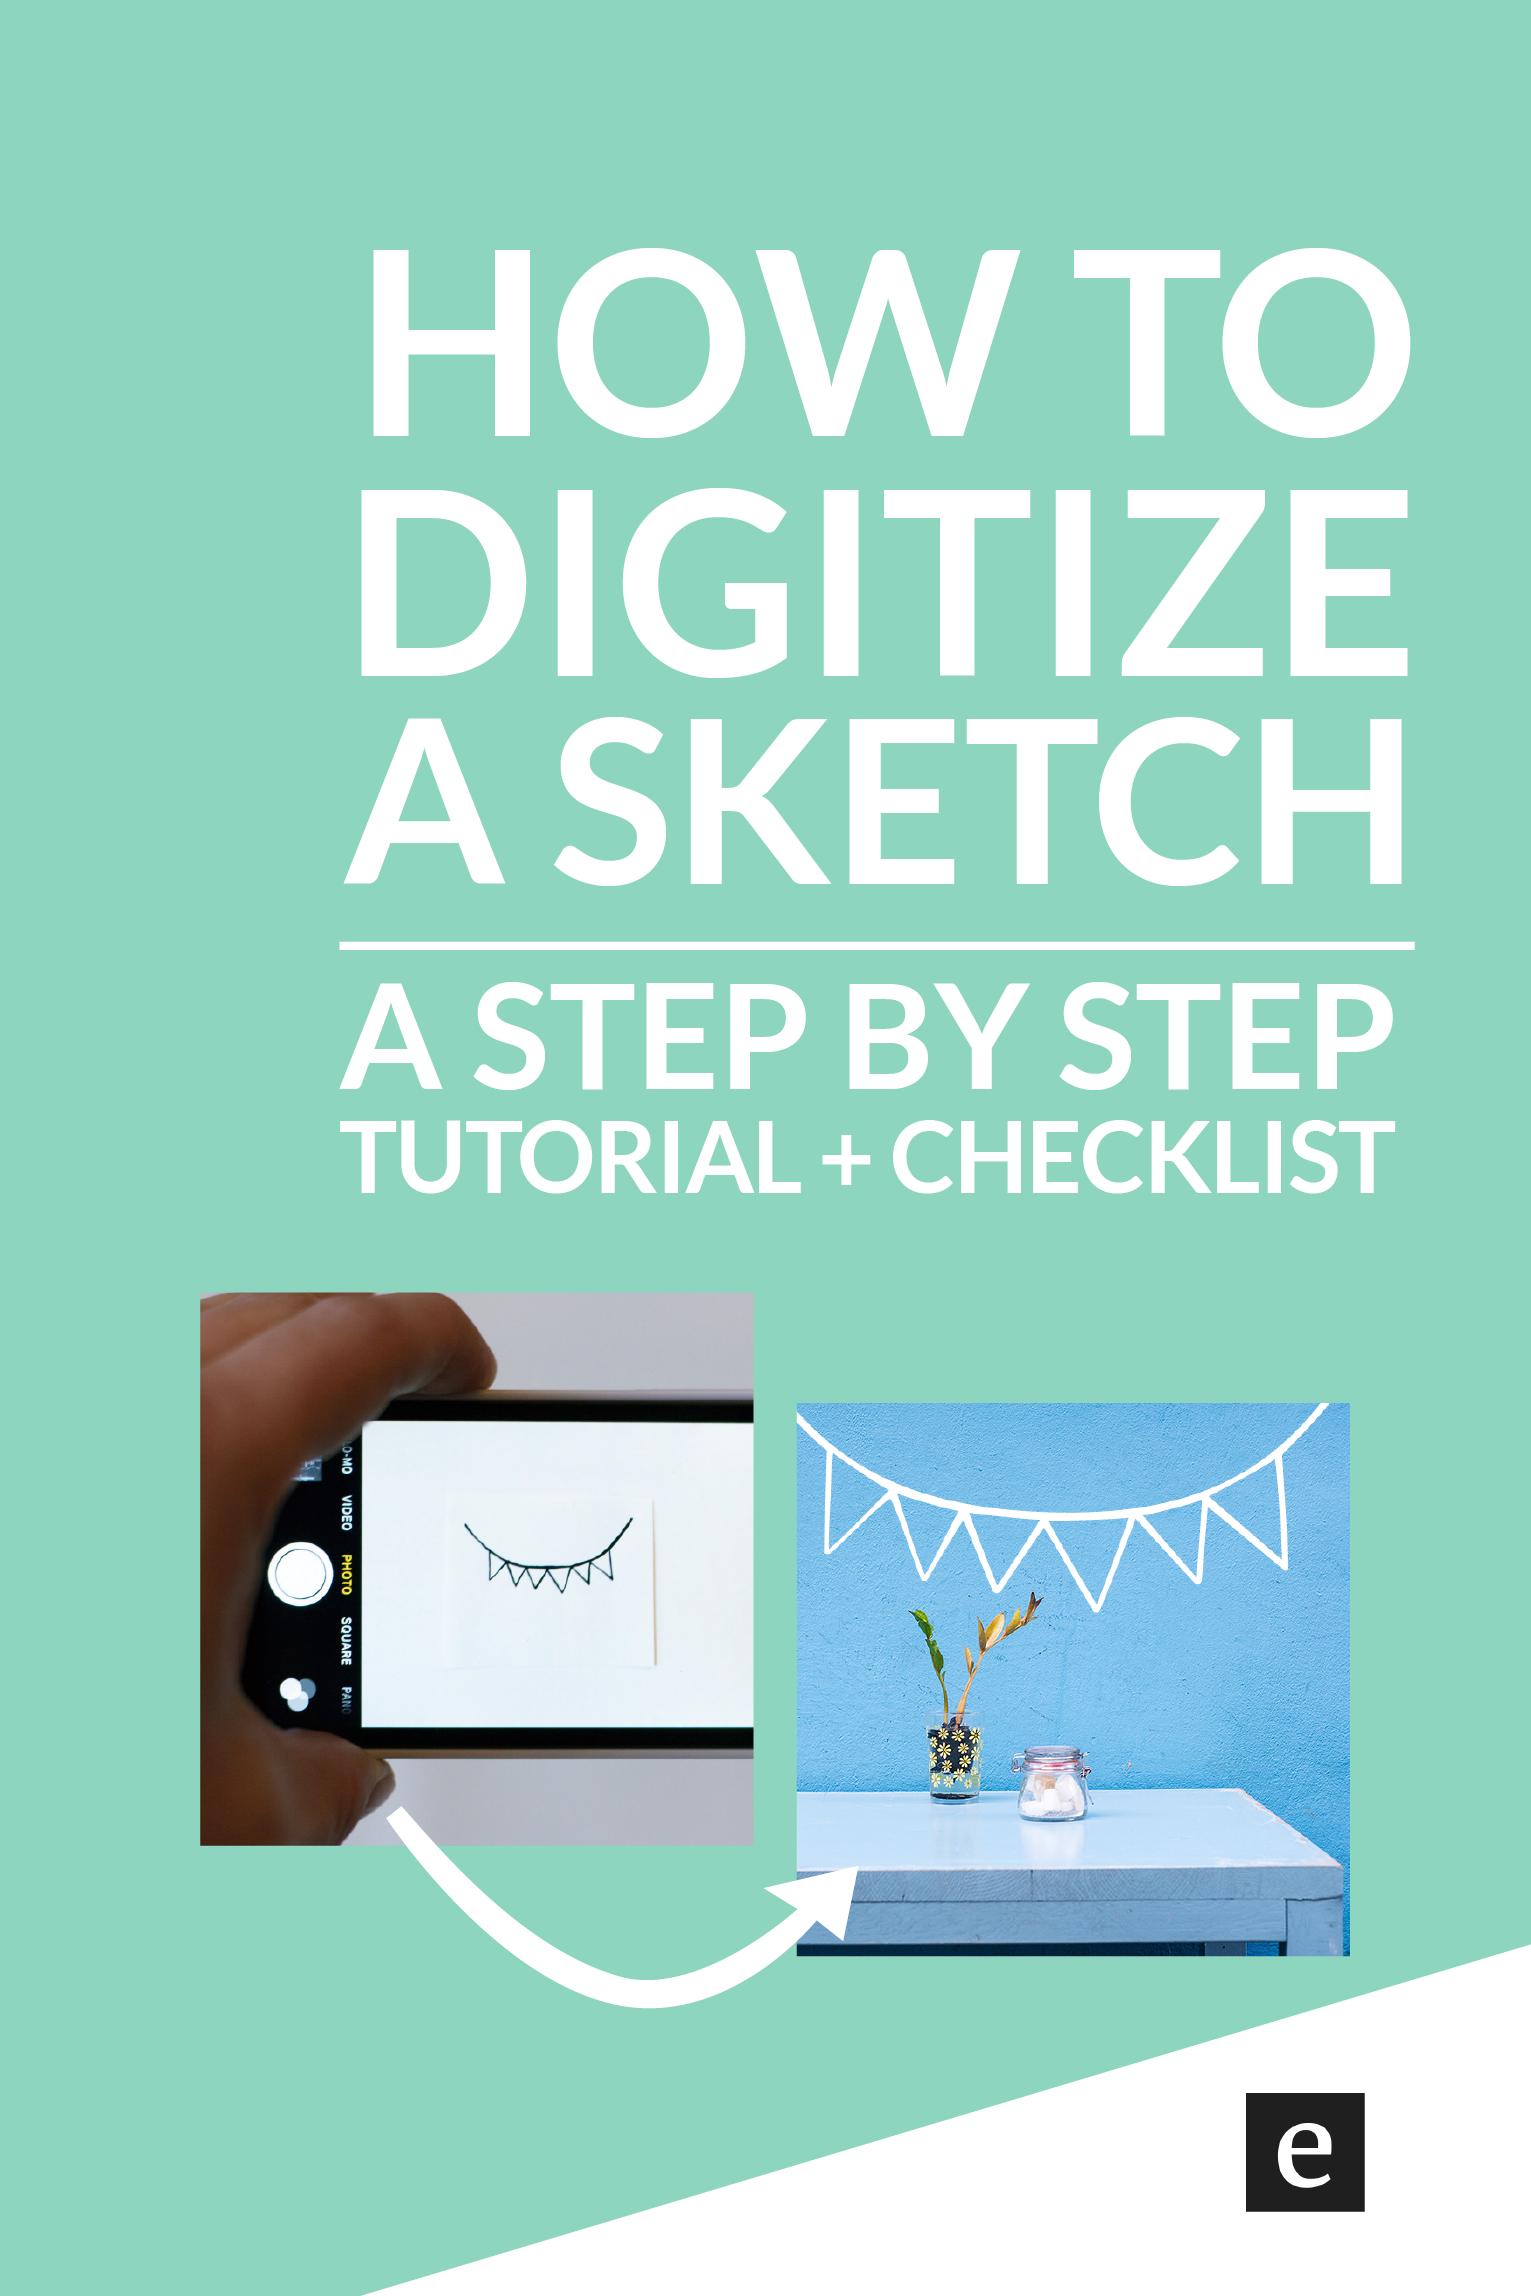 How To Turn A Sketch Into Digital Art | Design | Pinterest | Adobe ...